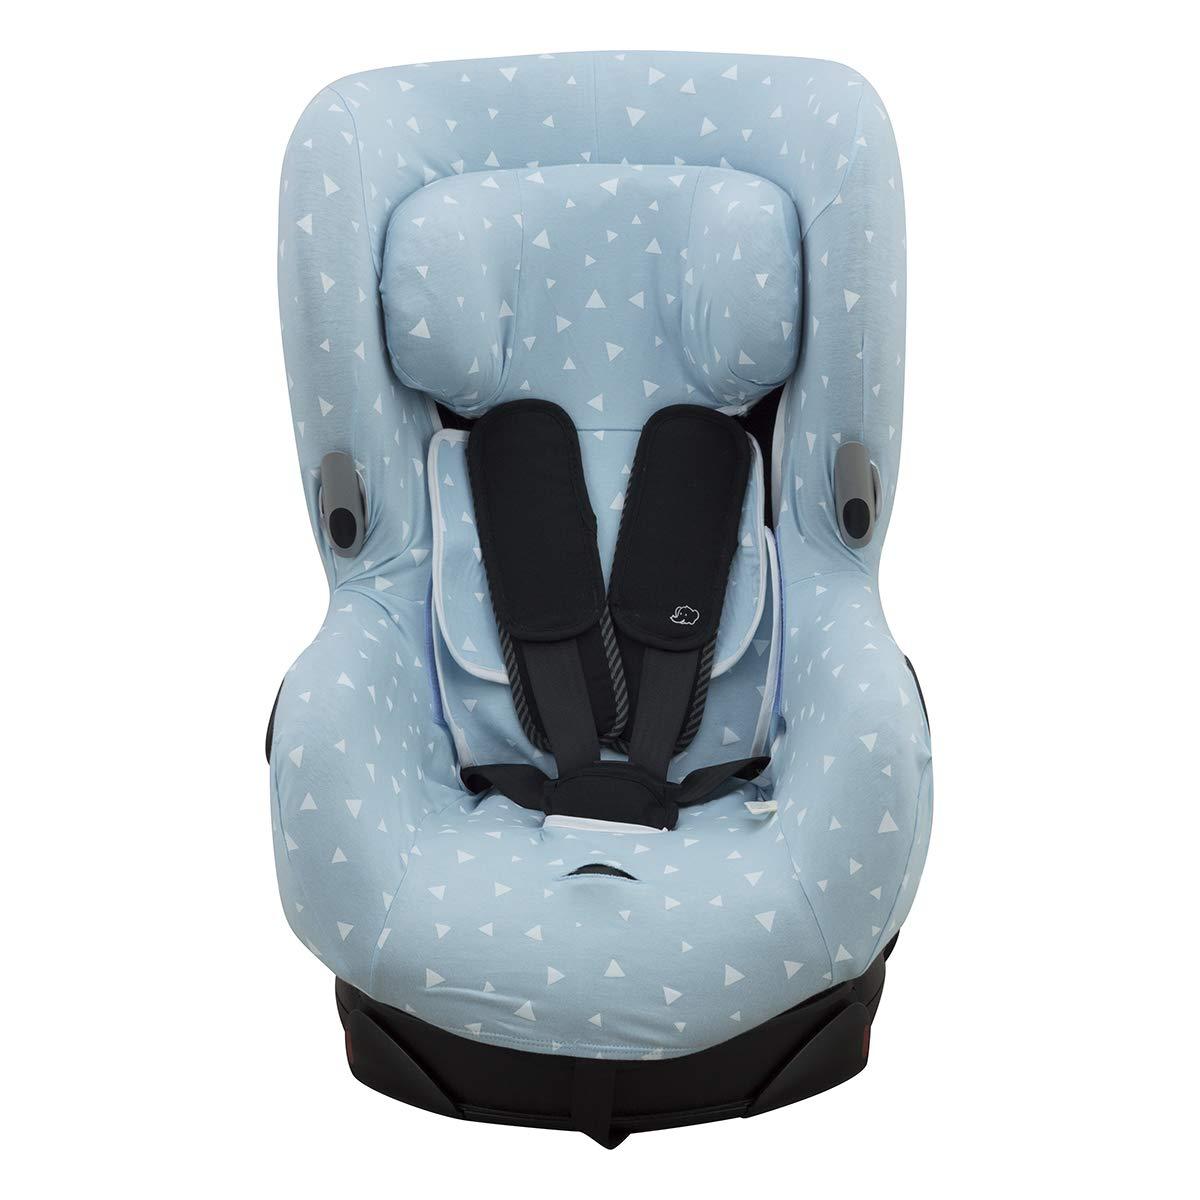 Janabebe Schutzhülle Für Bébé Confort Axiss Blue Sparkles Auto